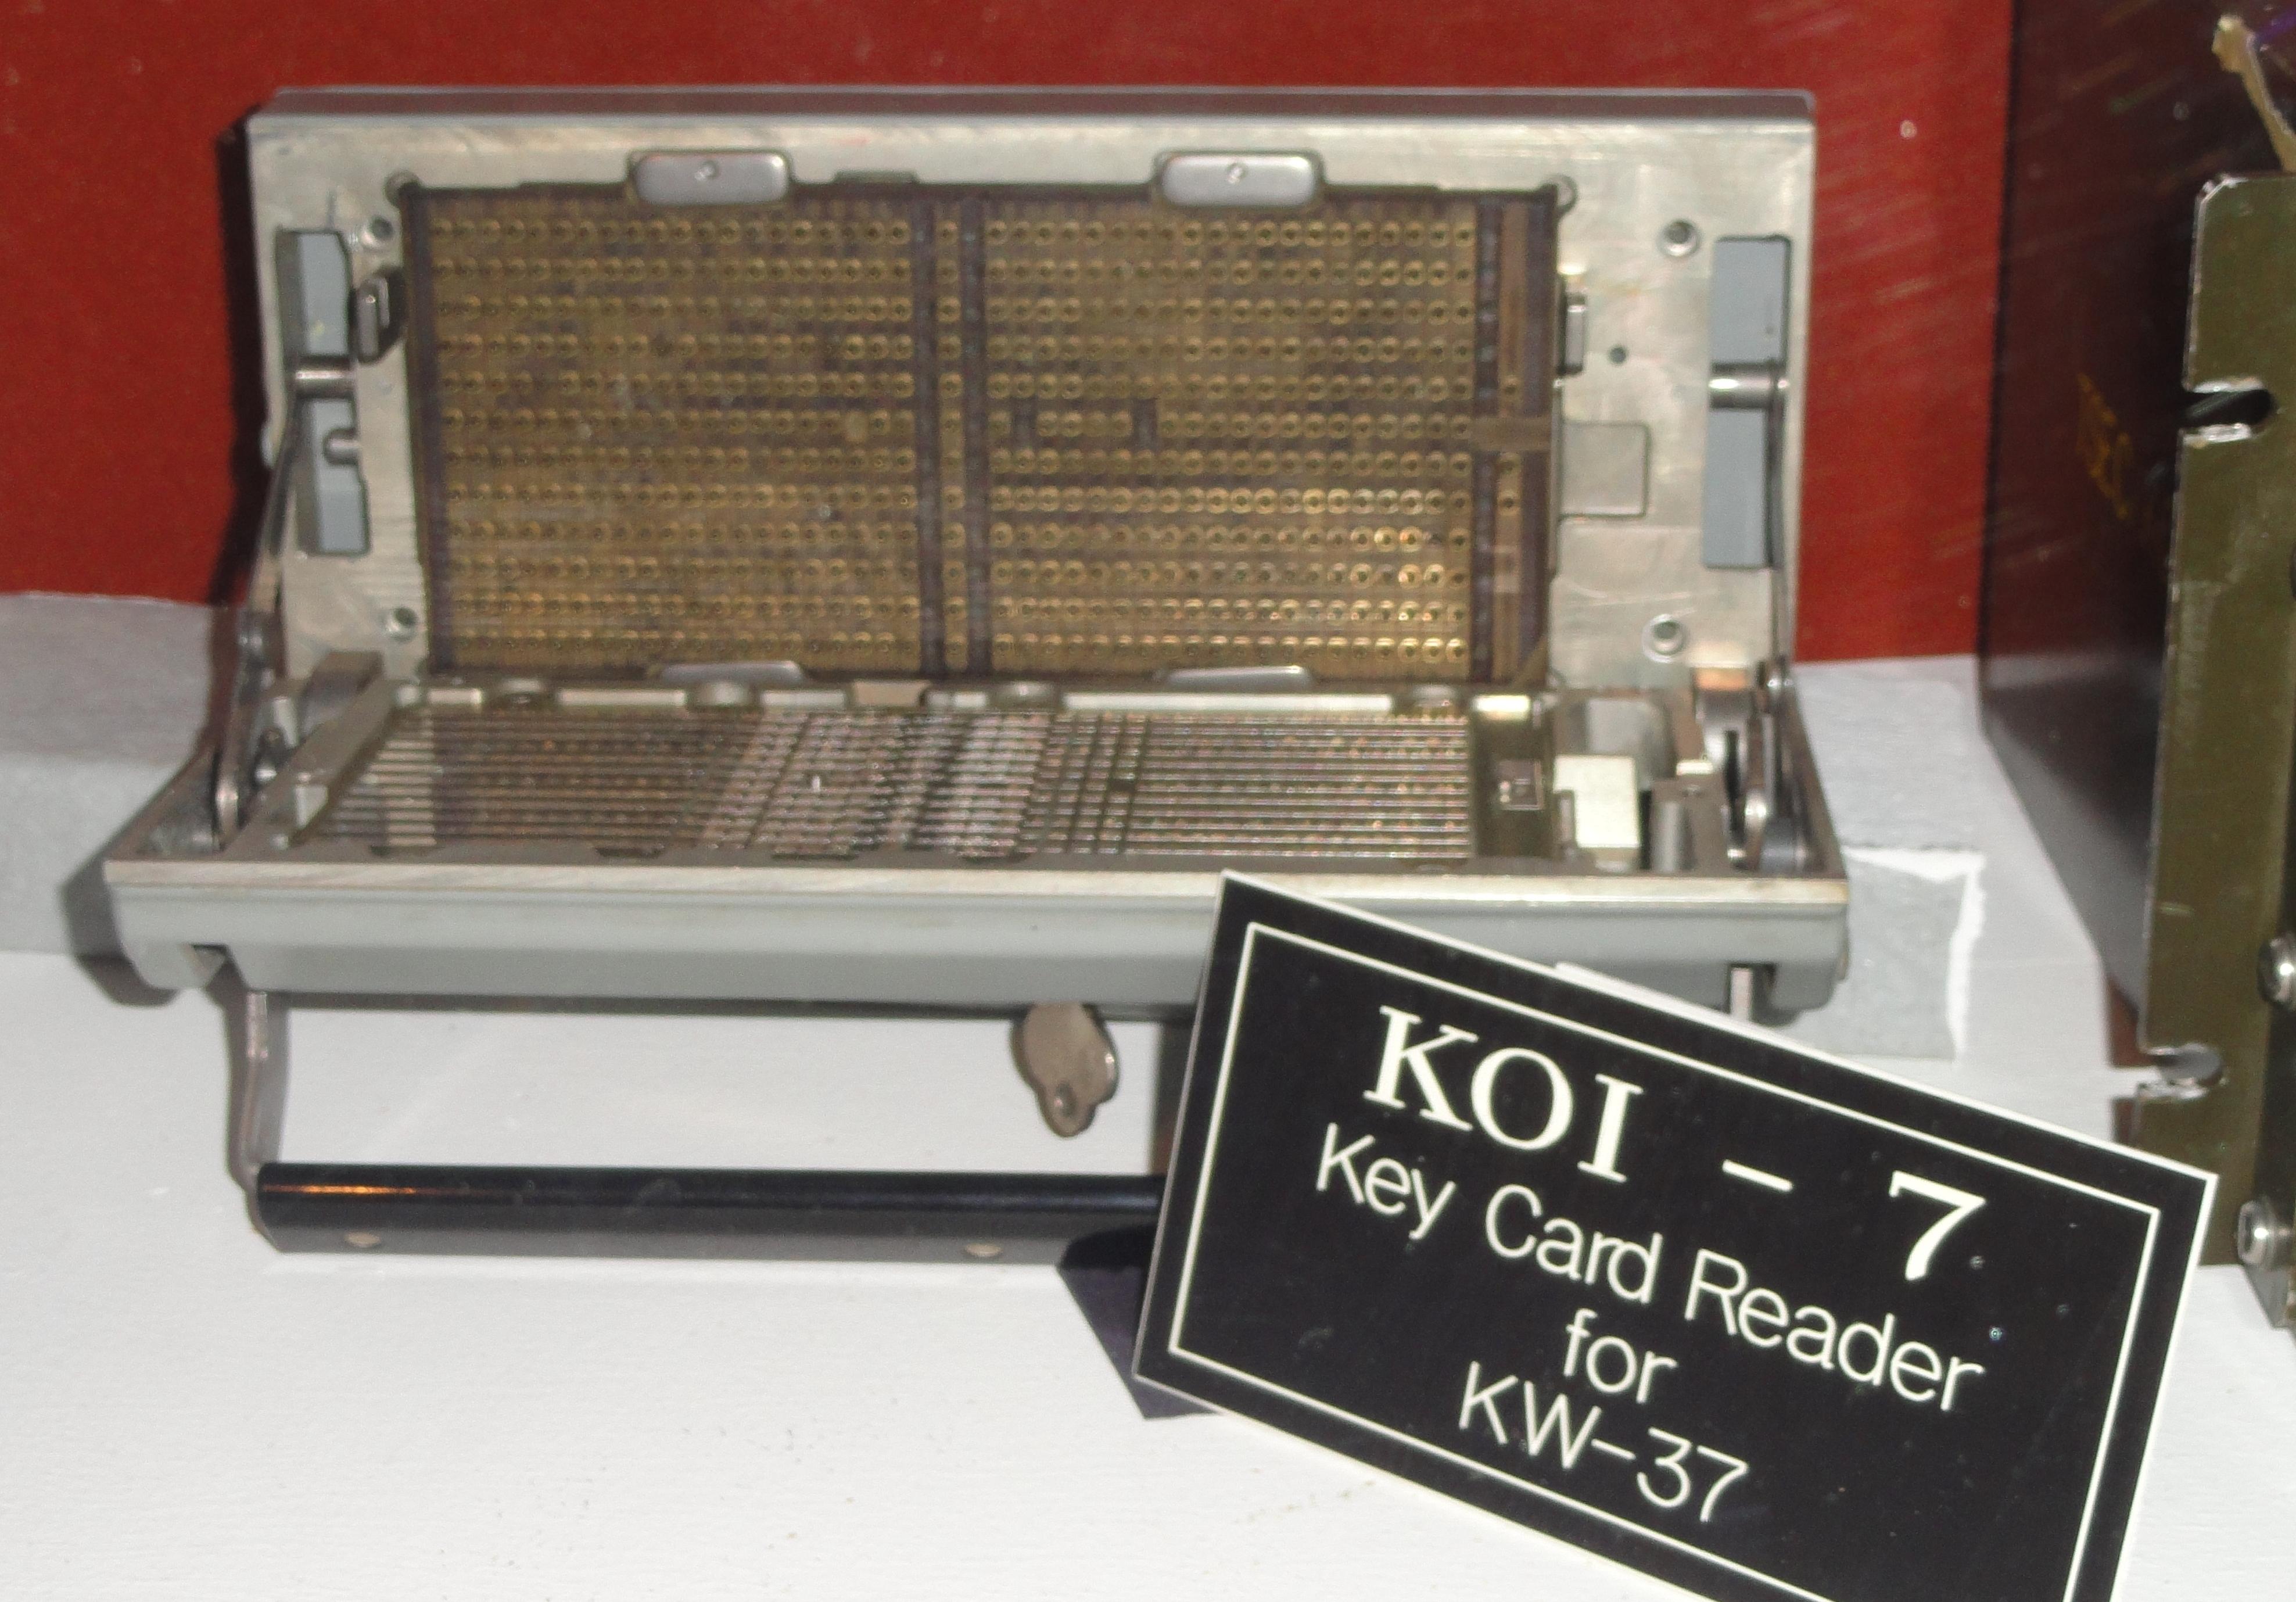 File:KOI-7 Key Card Reader for KW-37 - National Cryptologic Museum